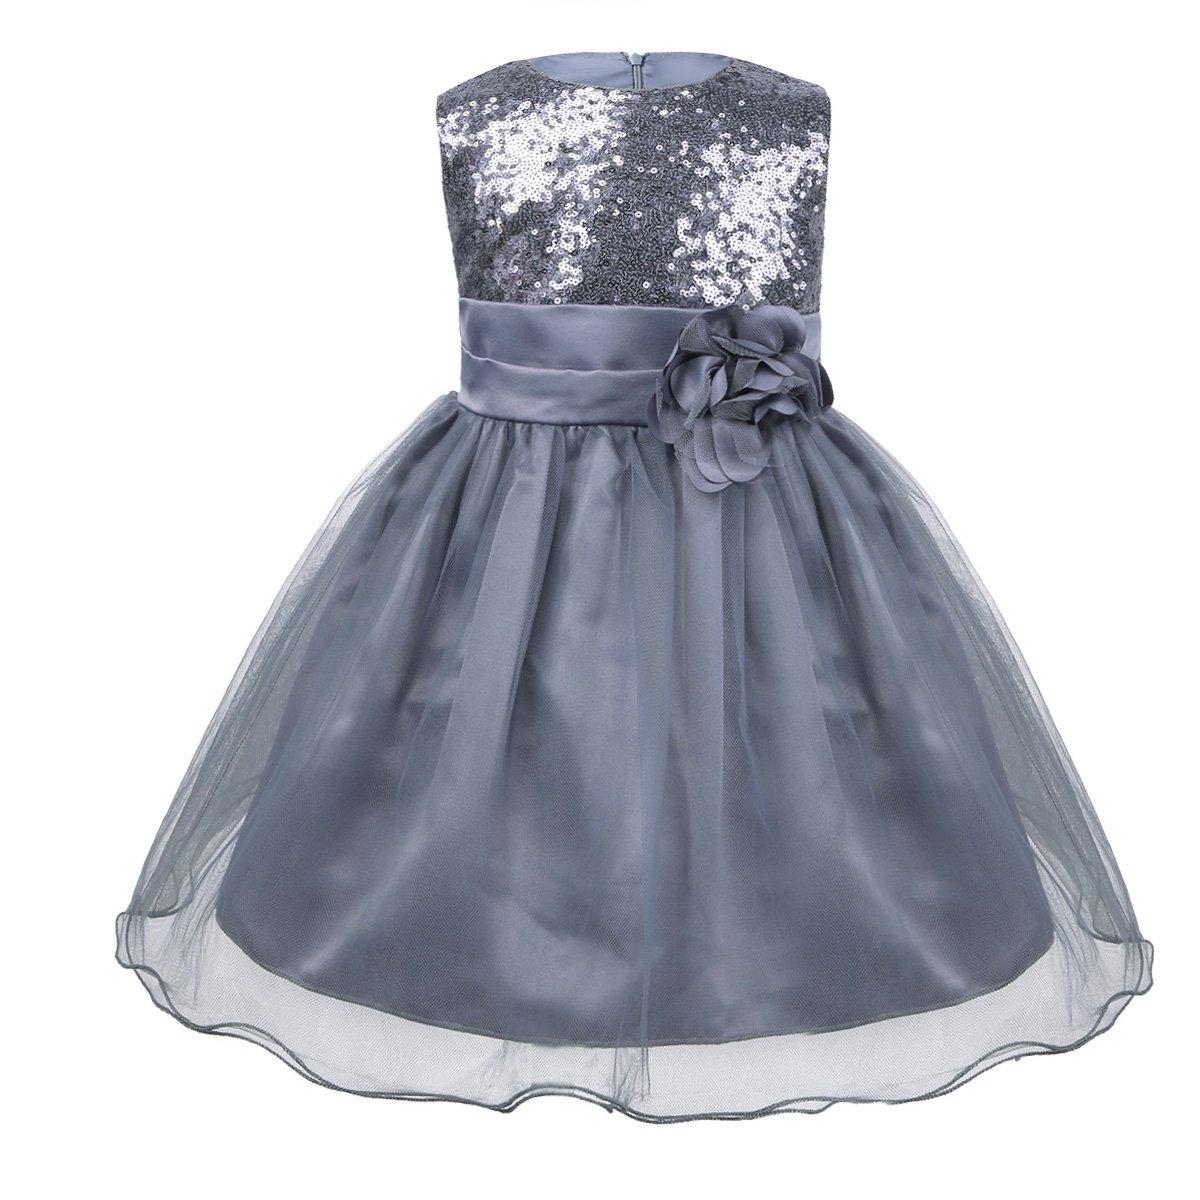 iiniim Baby Girls Sequins Formal Wedding Pageant Birthday Tutu Princess Party Flower Girl Dress Gray 12-18 Months